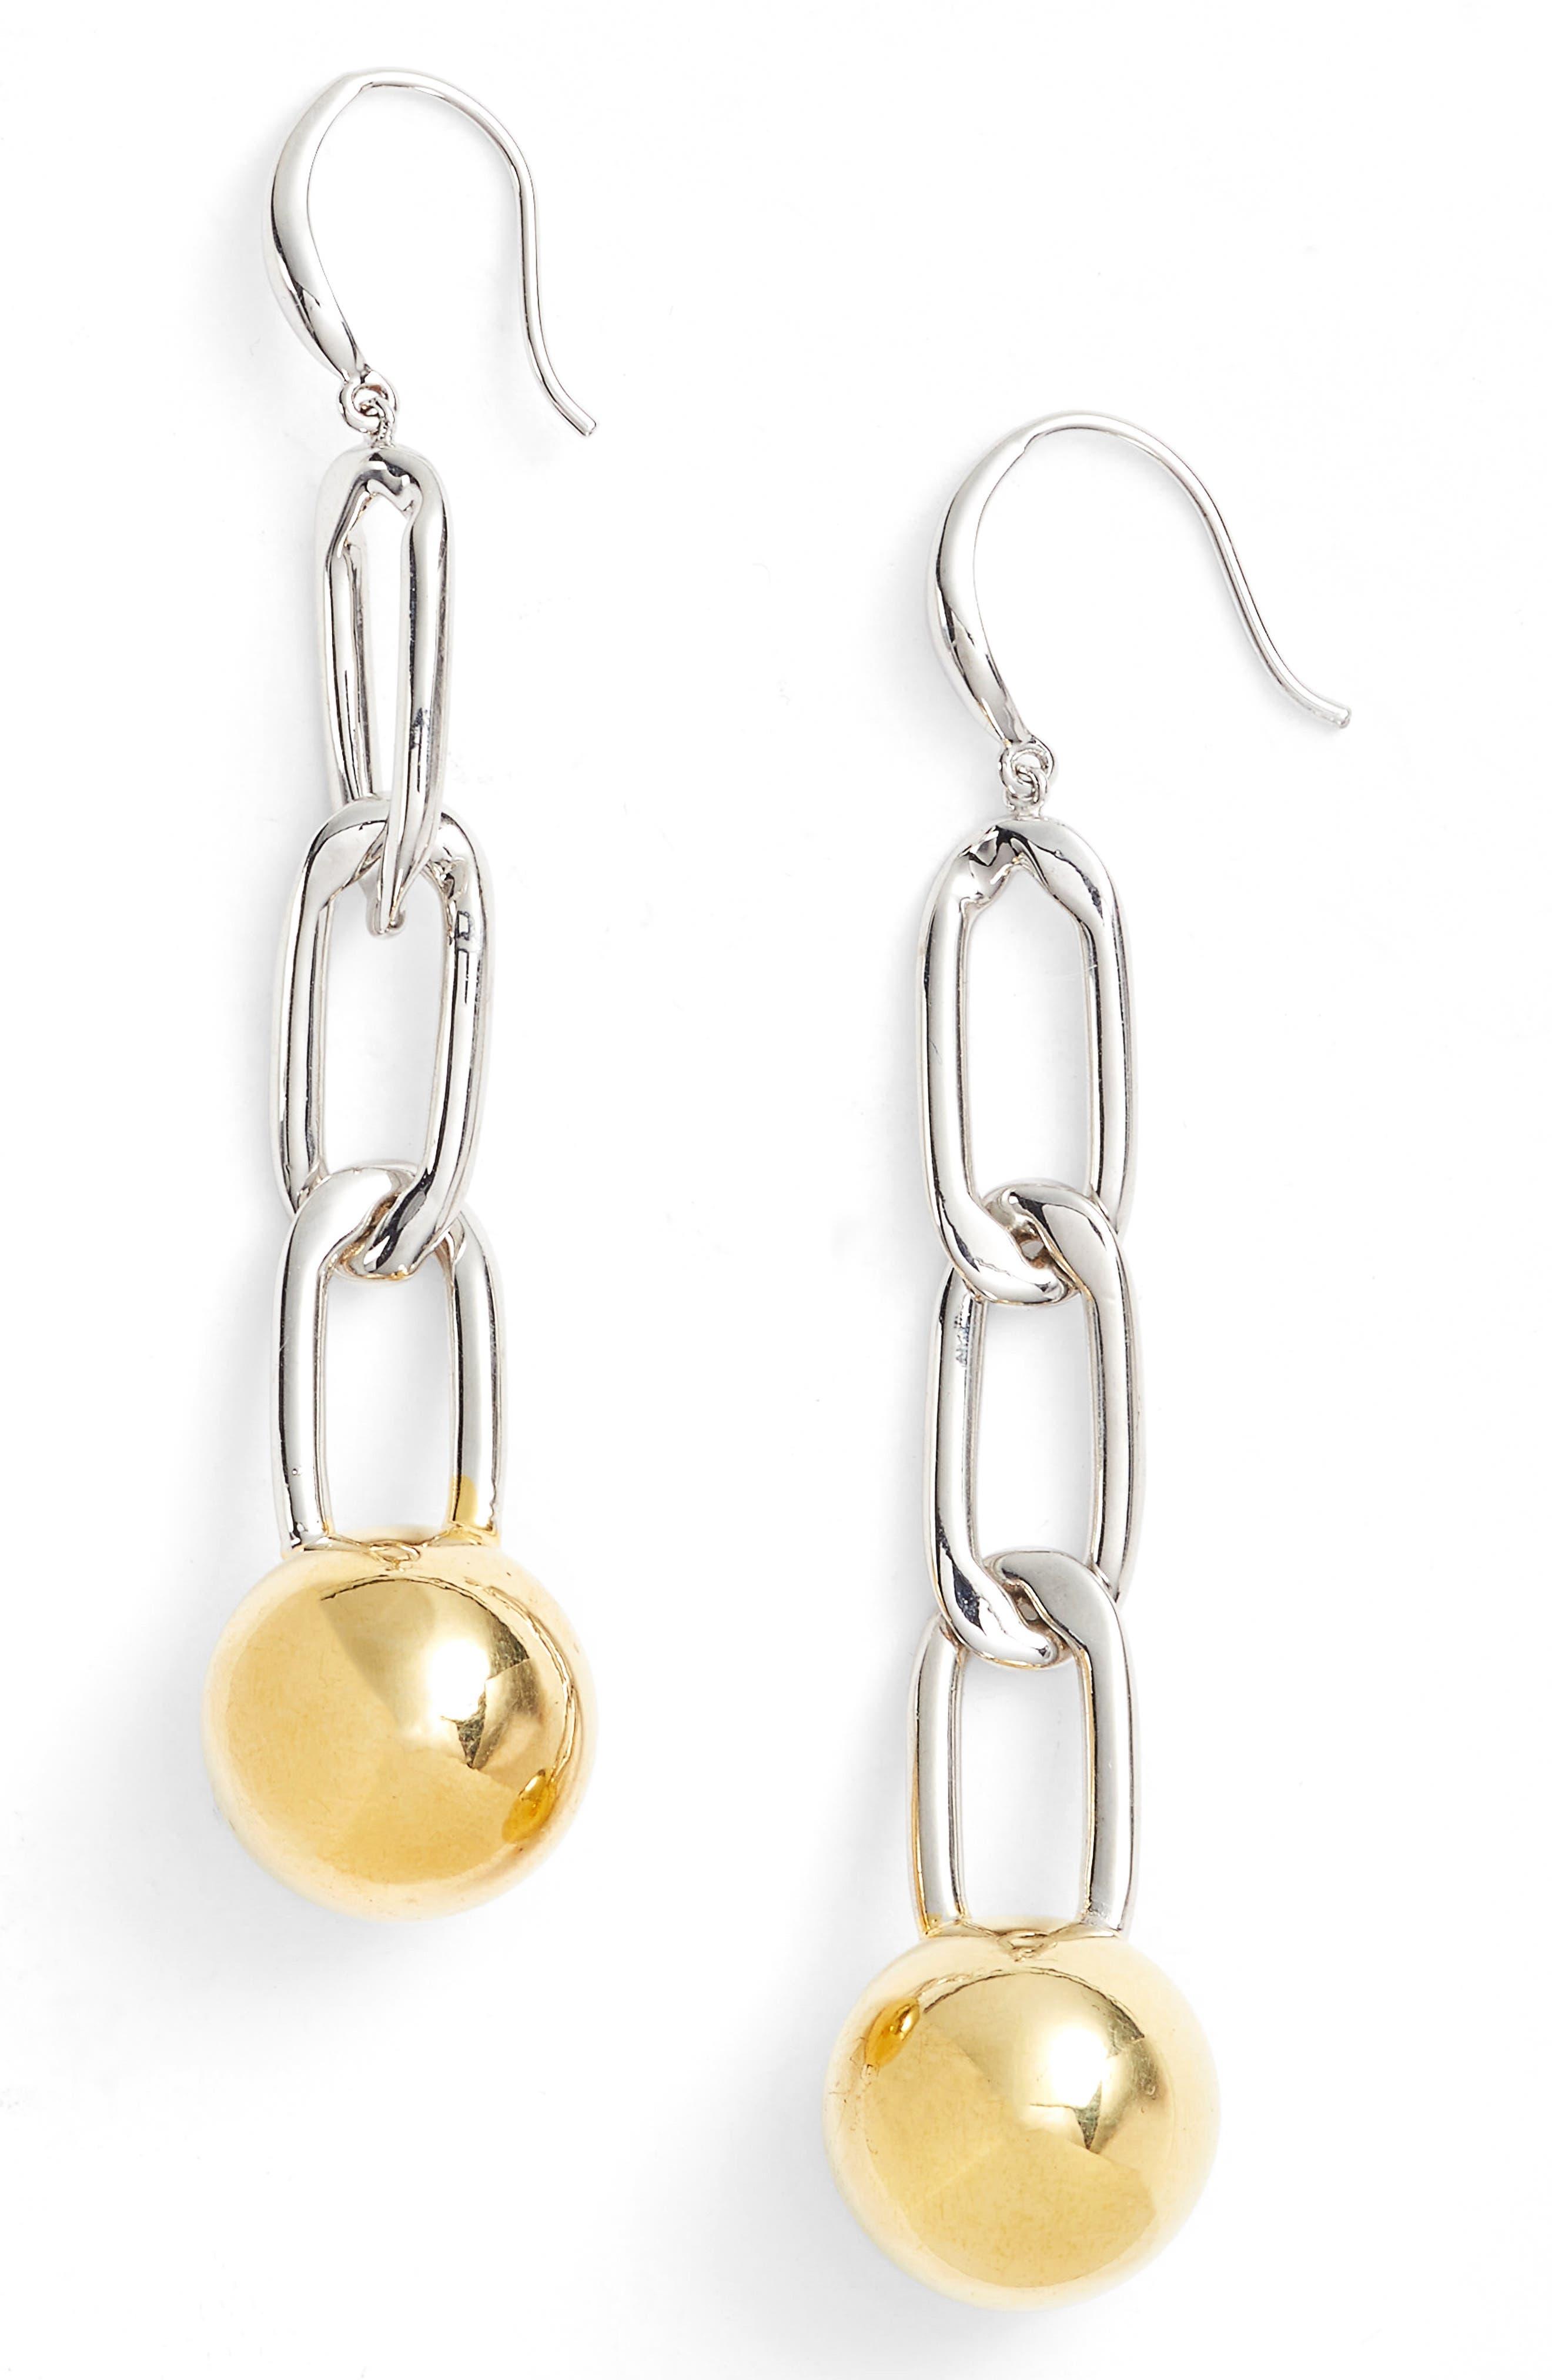 Argento Vivo Chain Ball Drop Earrings